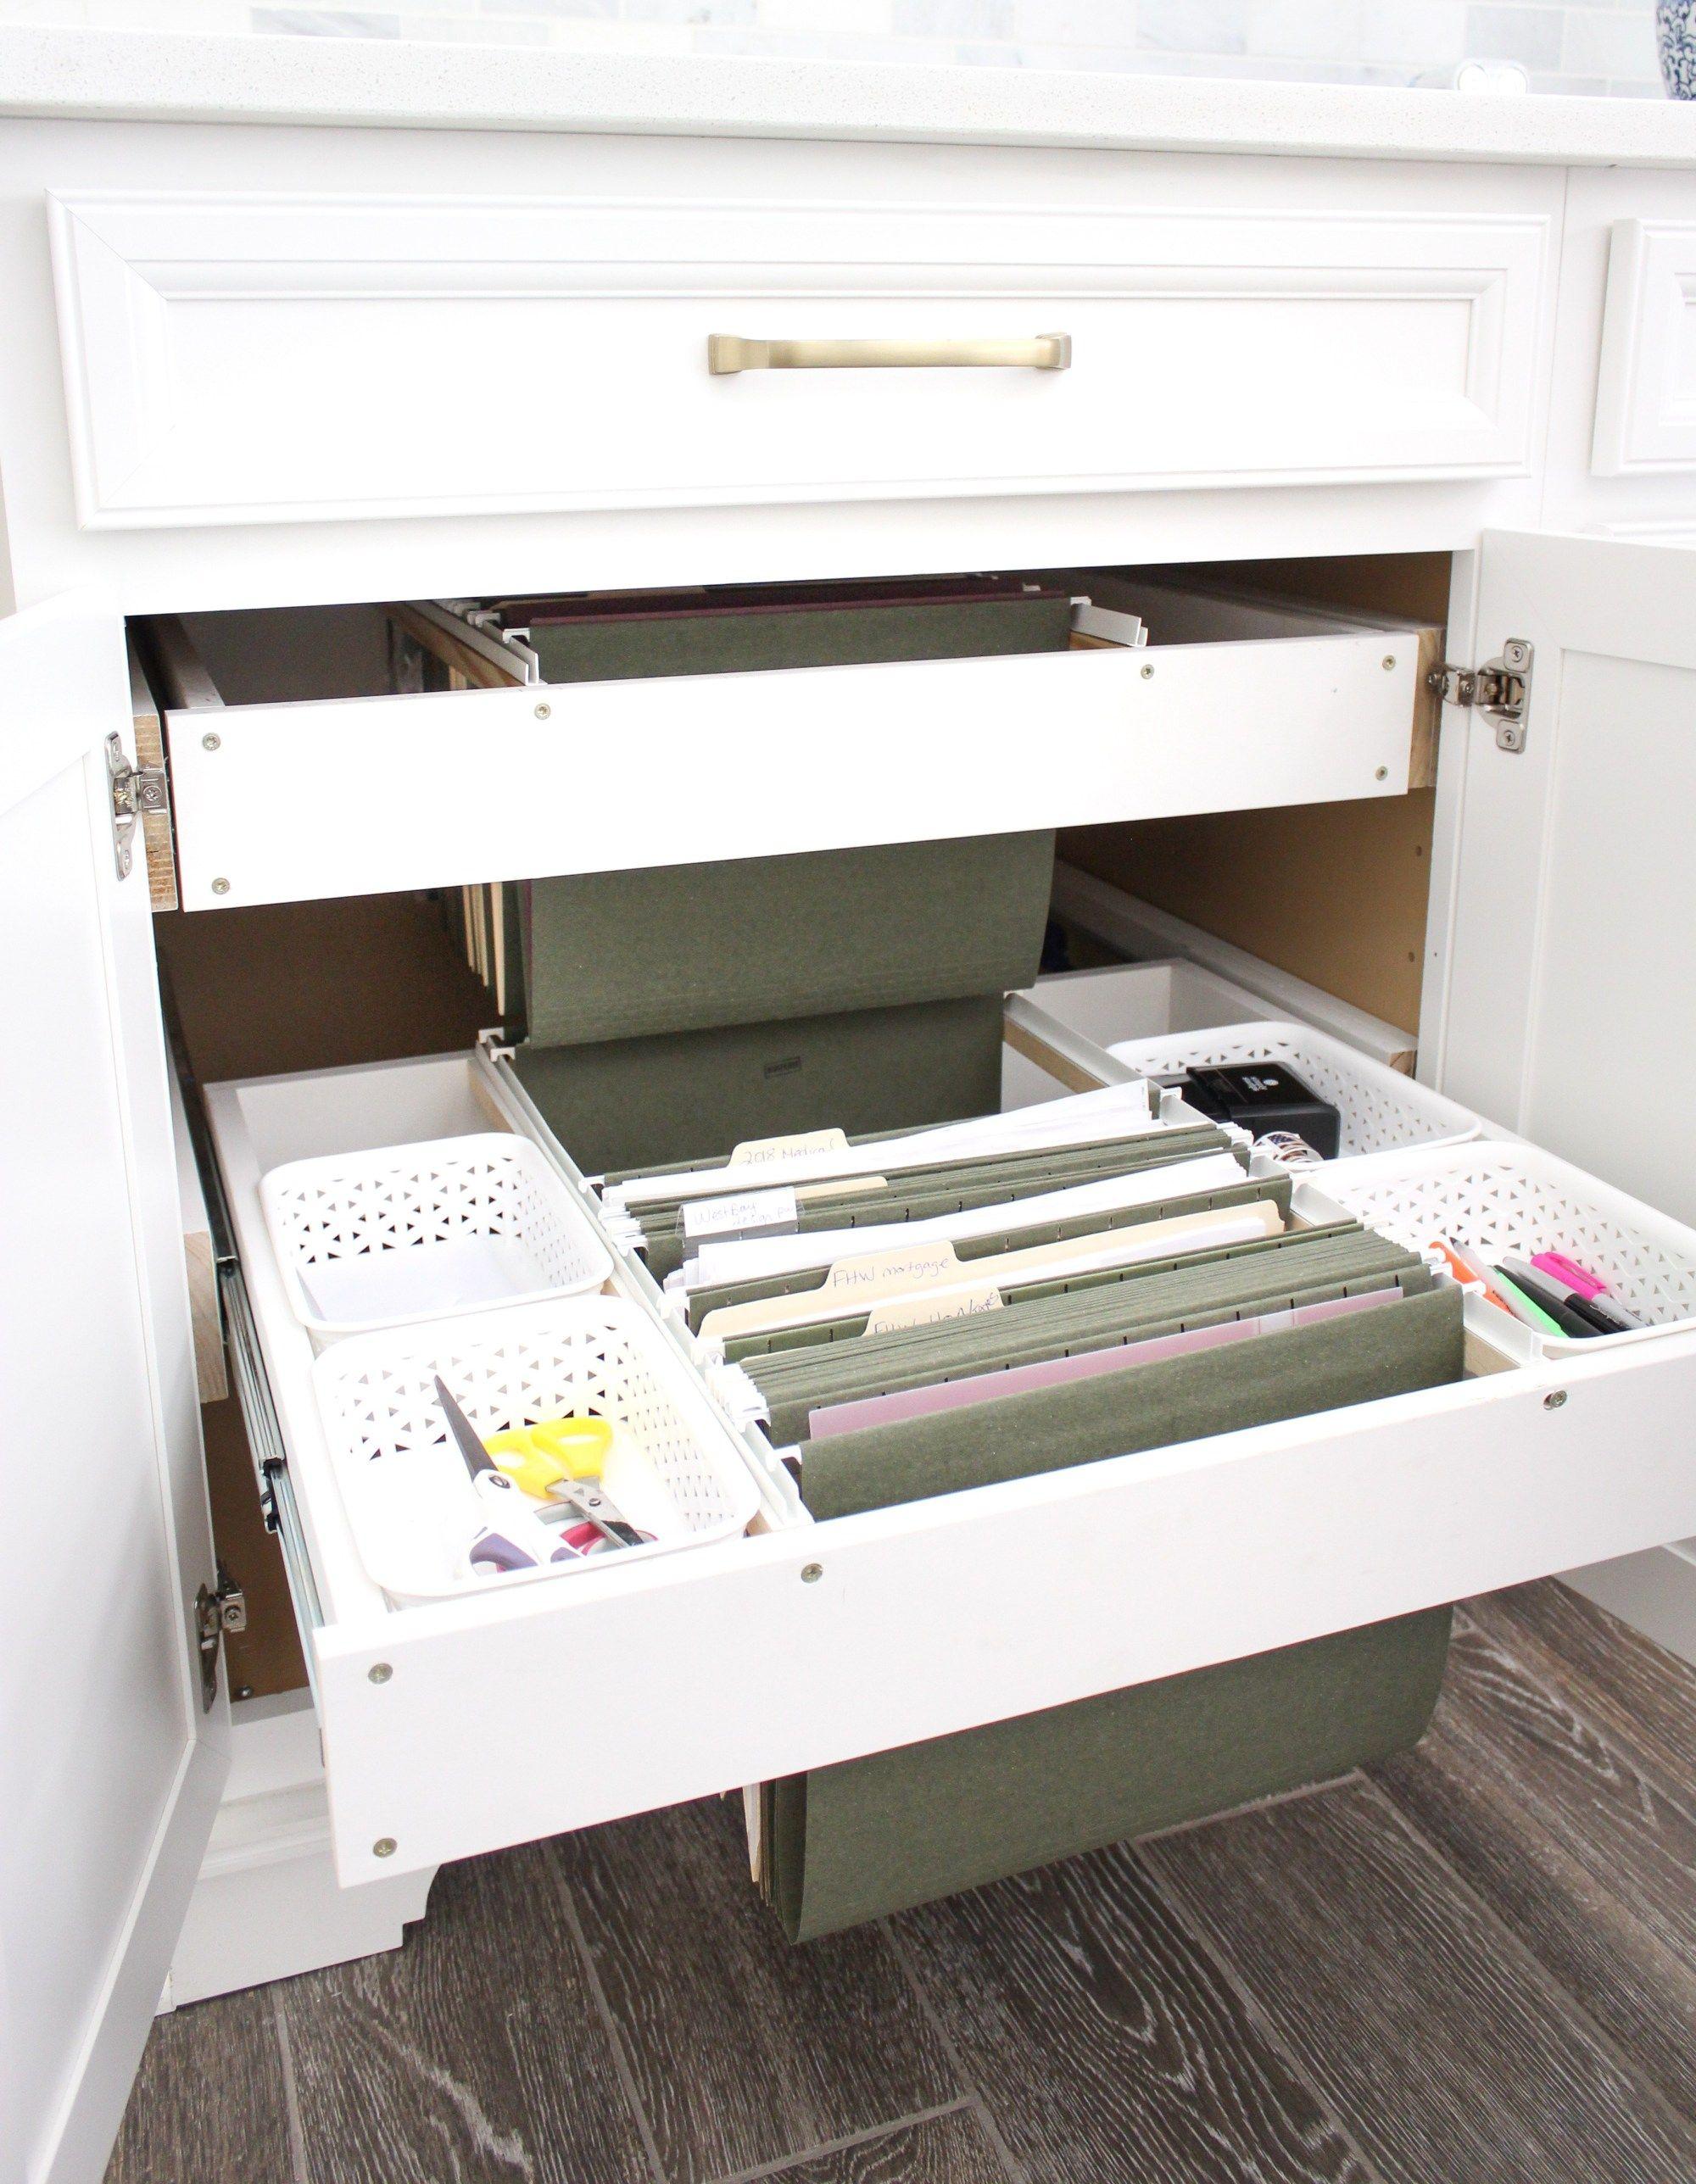 DIY Hanging File Drawer in Kitchen Frills and